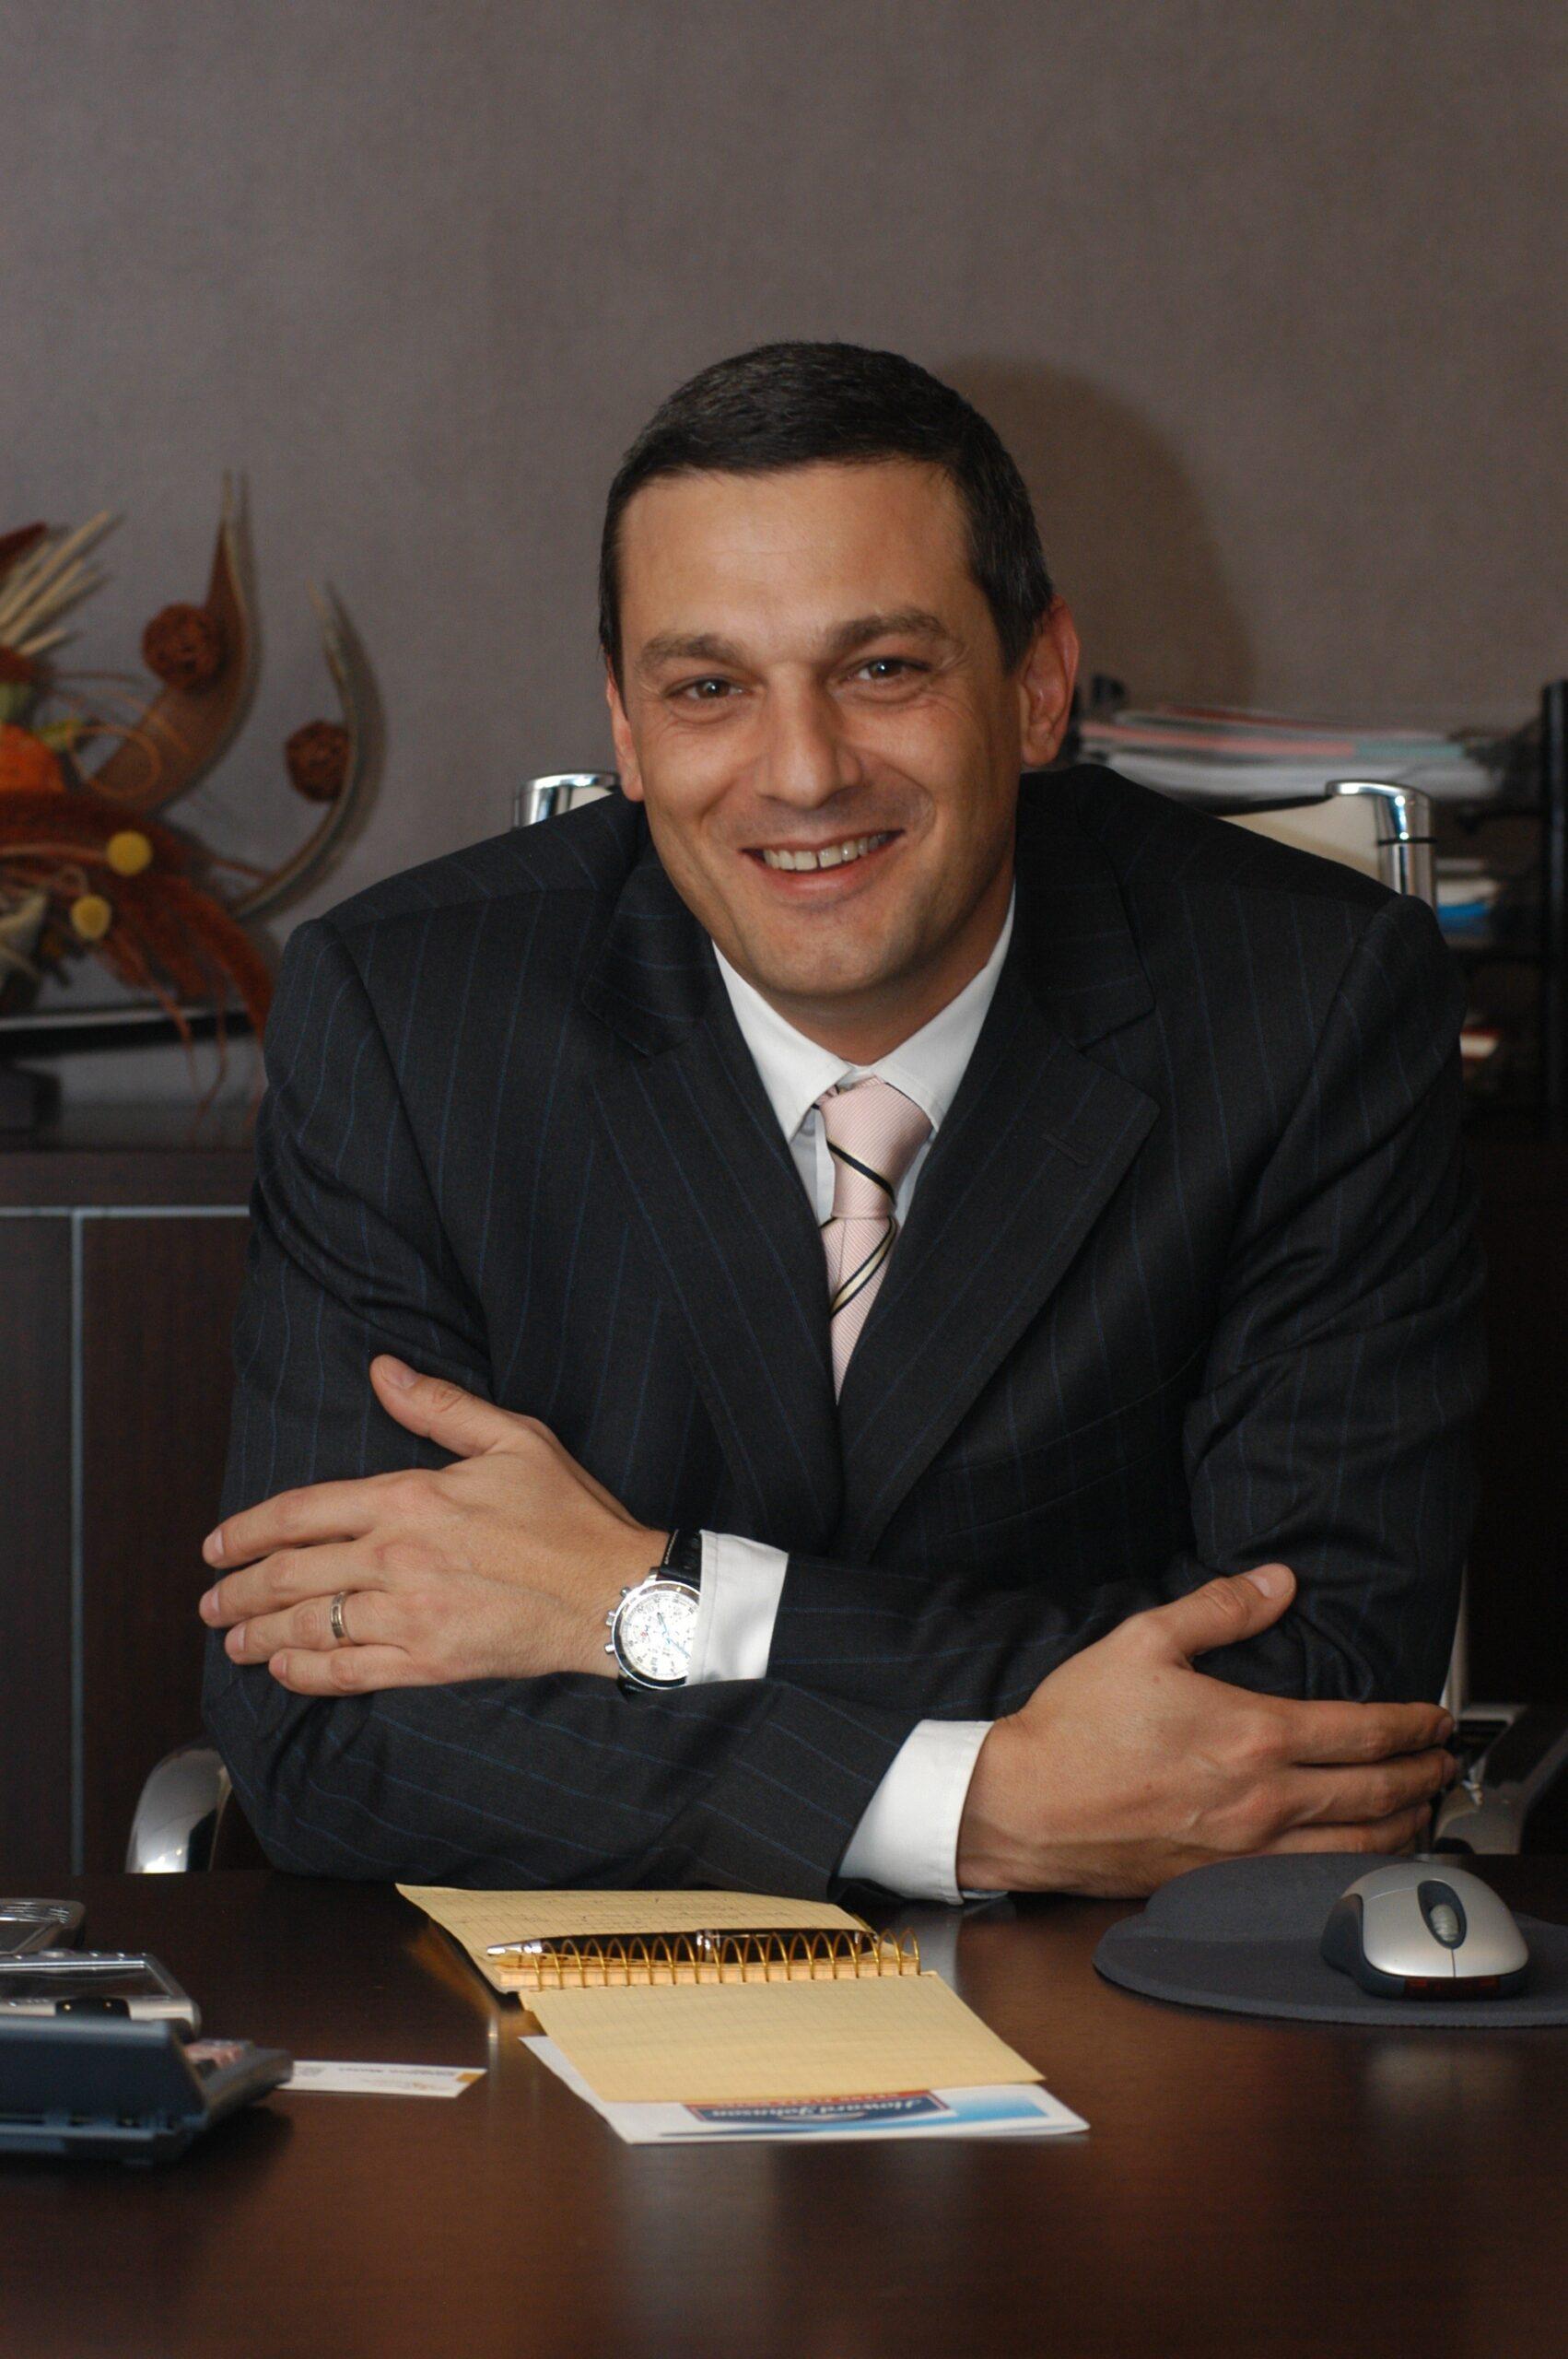 Constantin Sebeșanu este noul Director de Dezvoltare al Impact Developer & Contractor